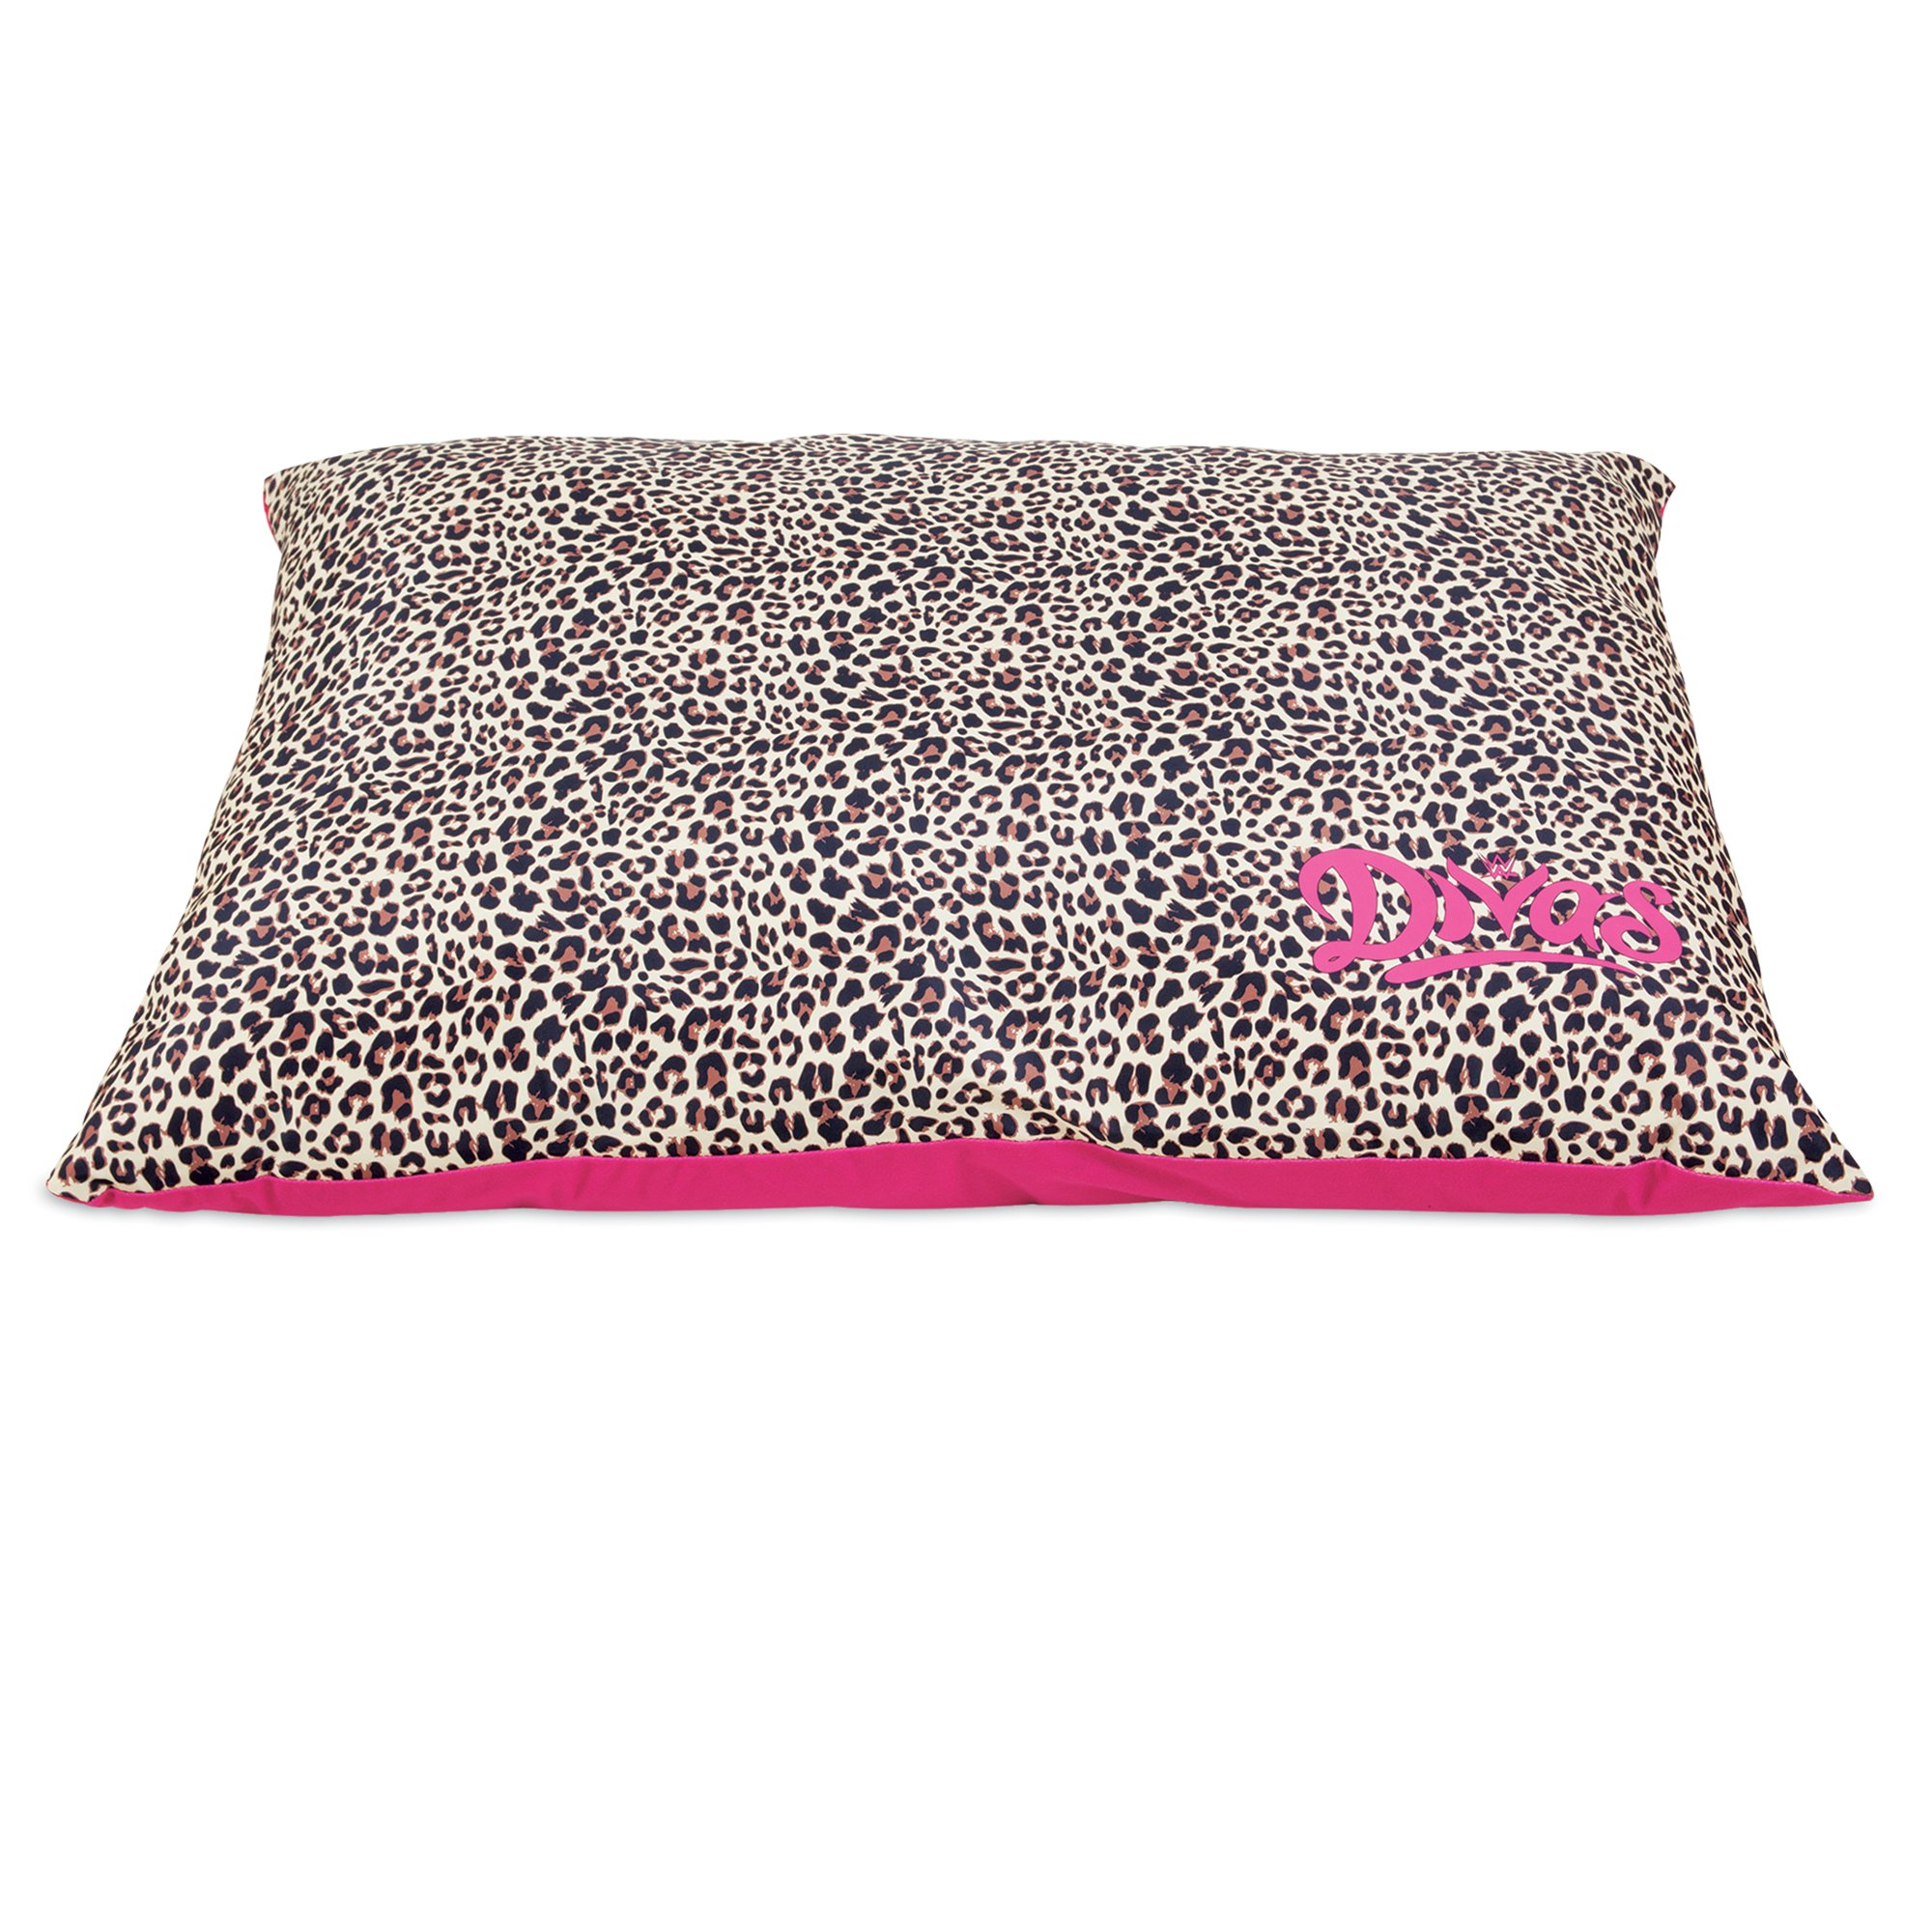 Wwe Divas Pillow Dog Bed In Pink Petco